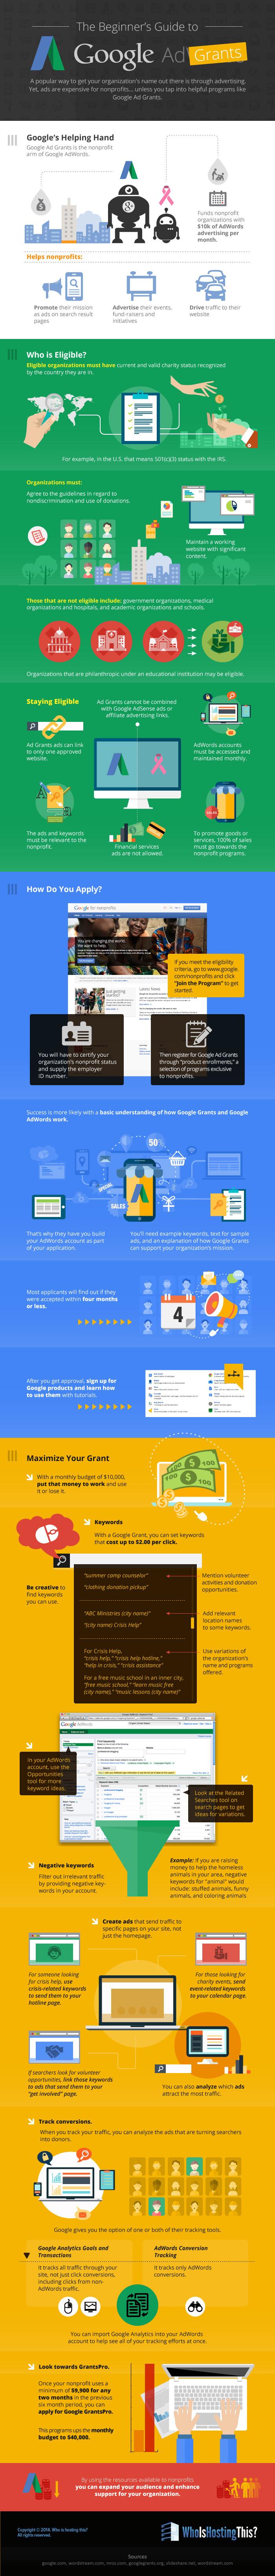 Google Ad Grant Infographic